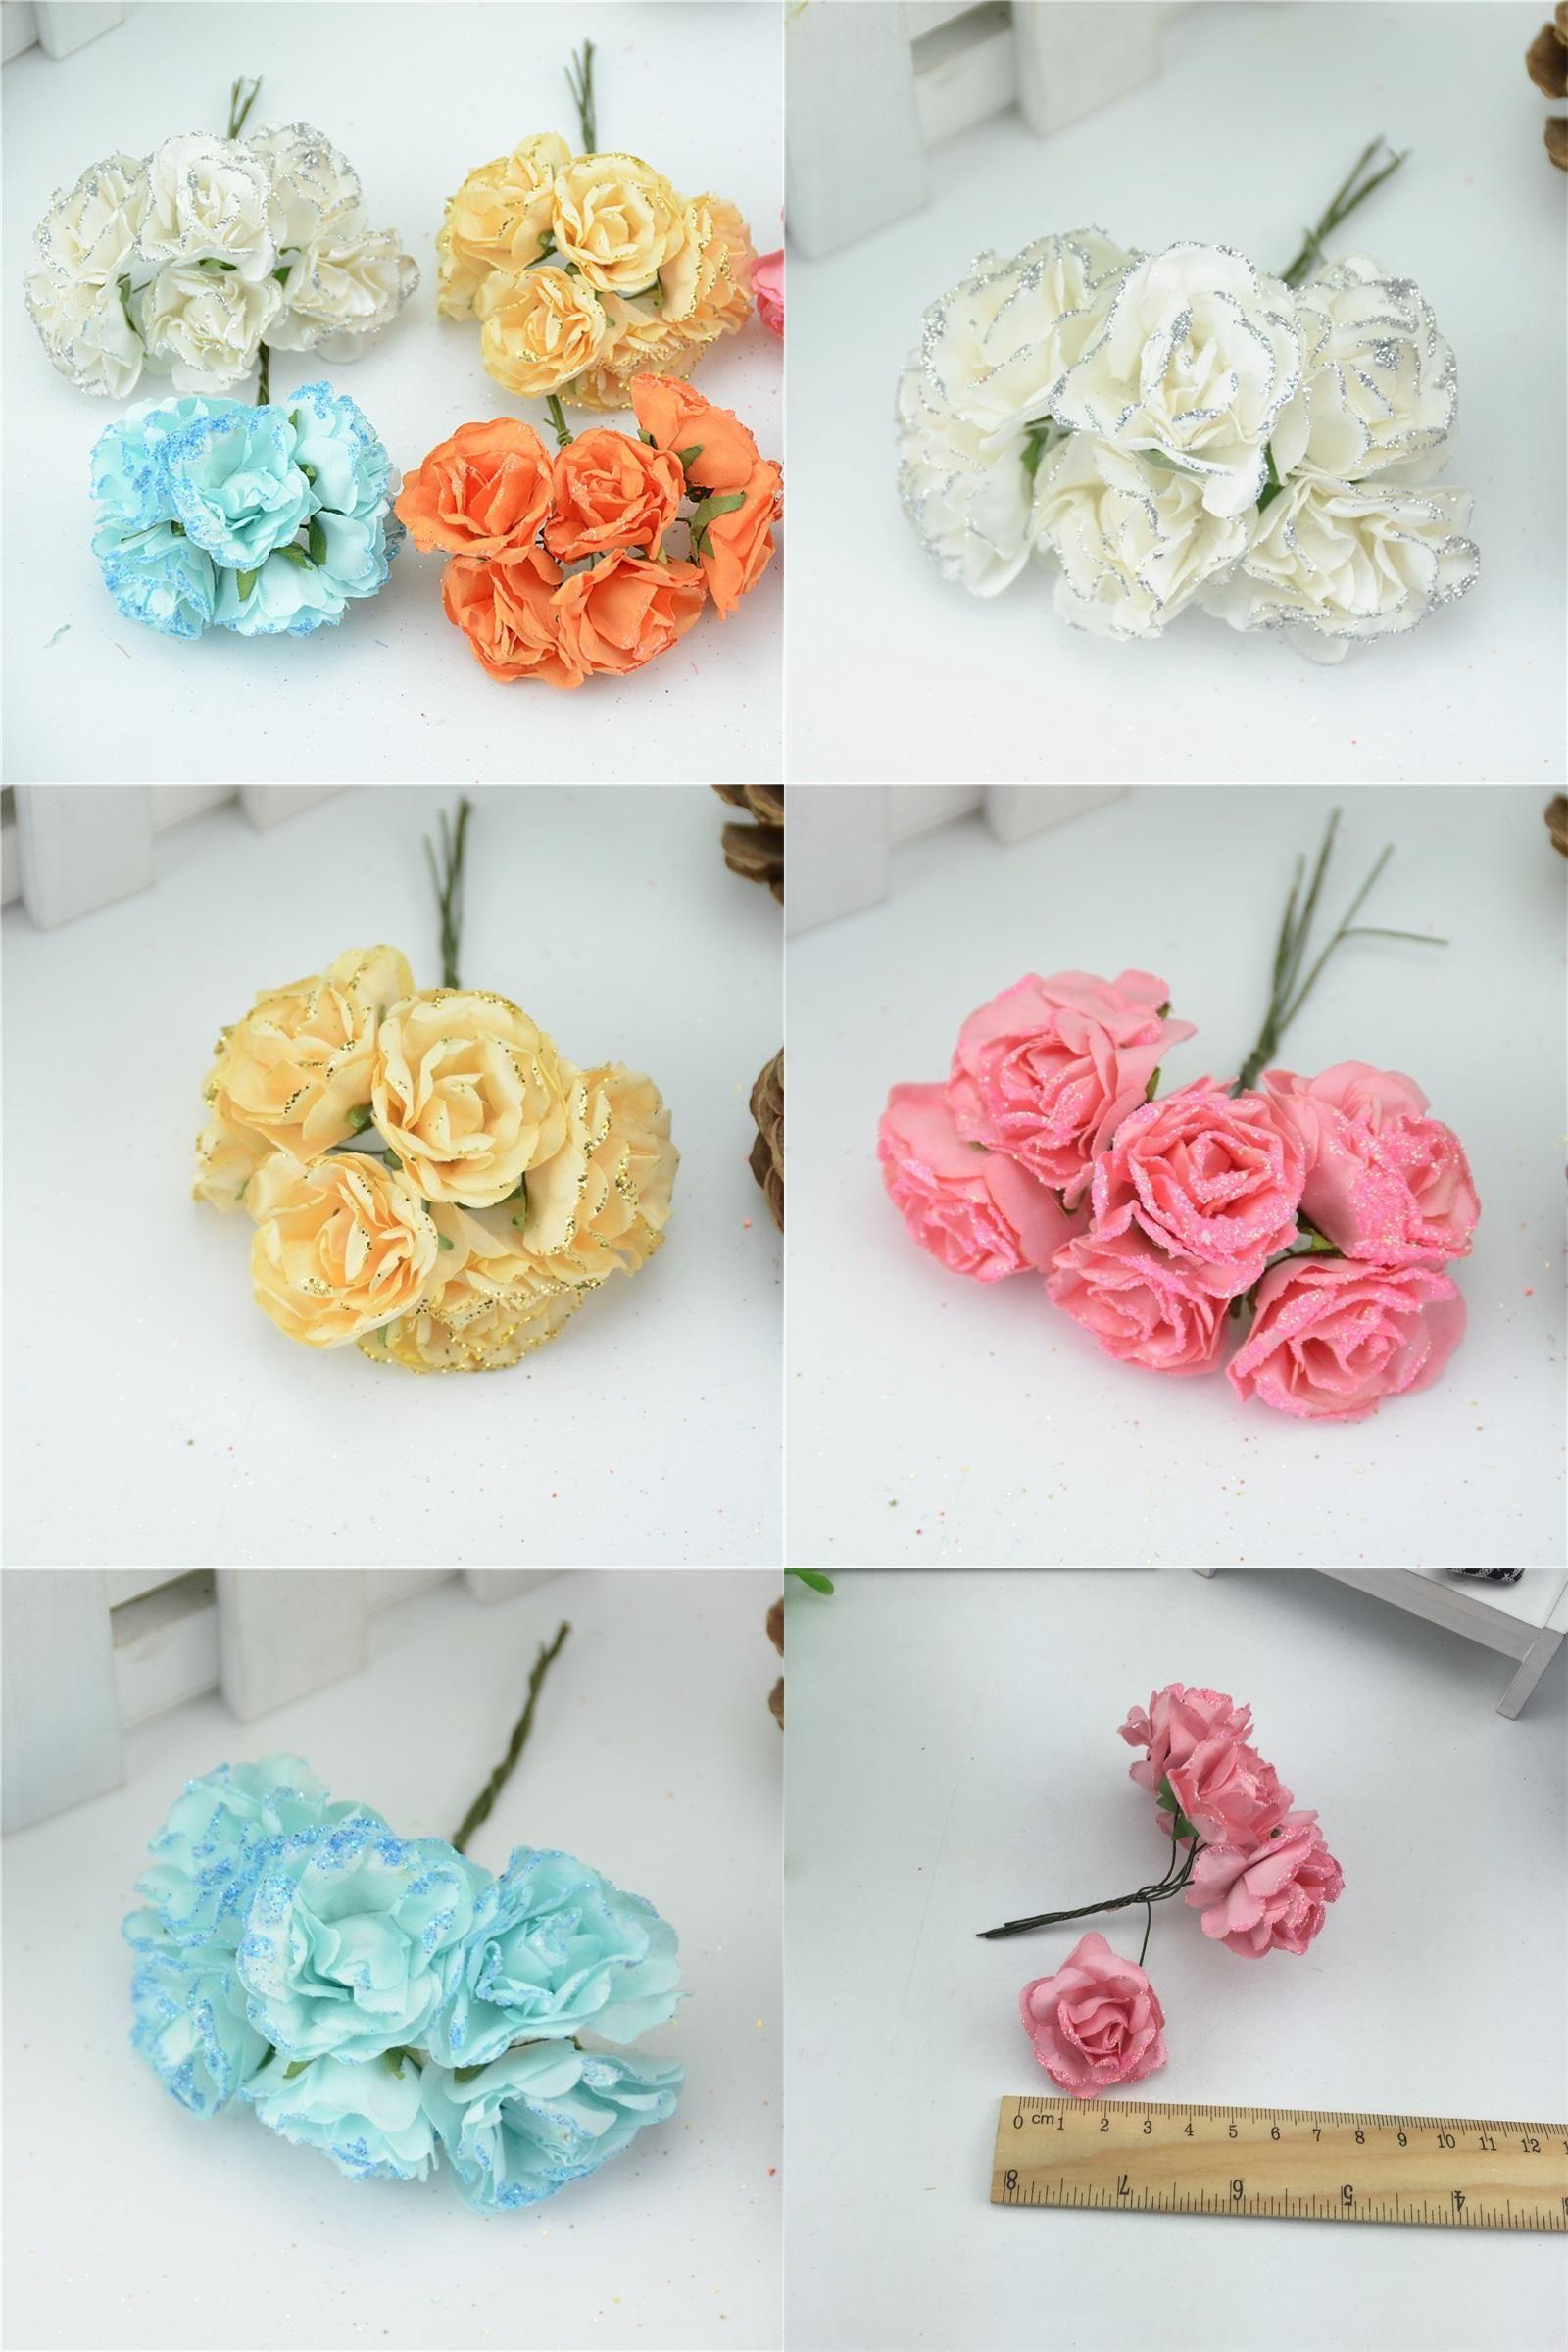 Visit To Buy 6pcslot 4cm Heads Peony Mini Paper Flowers Bouquet